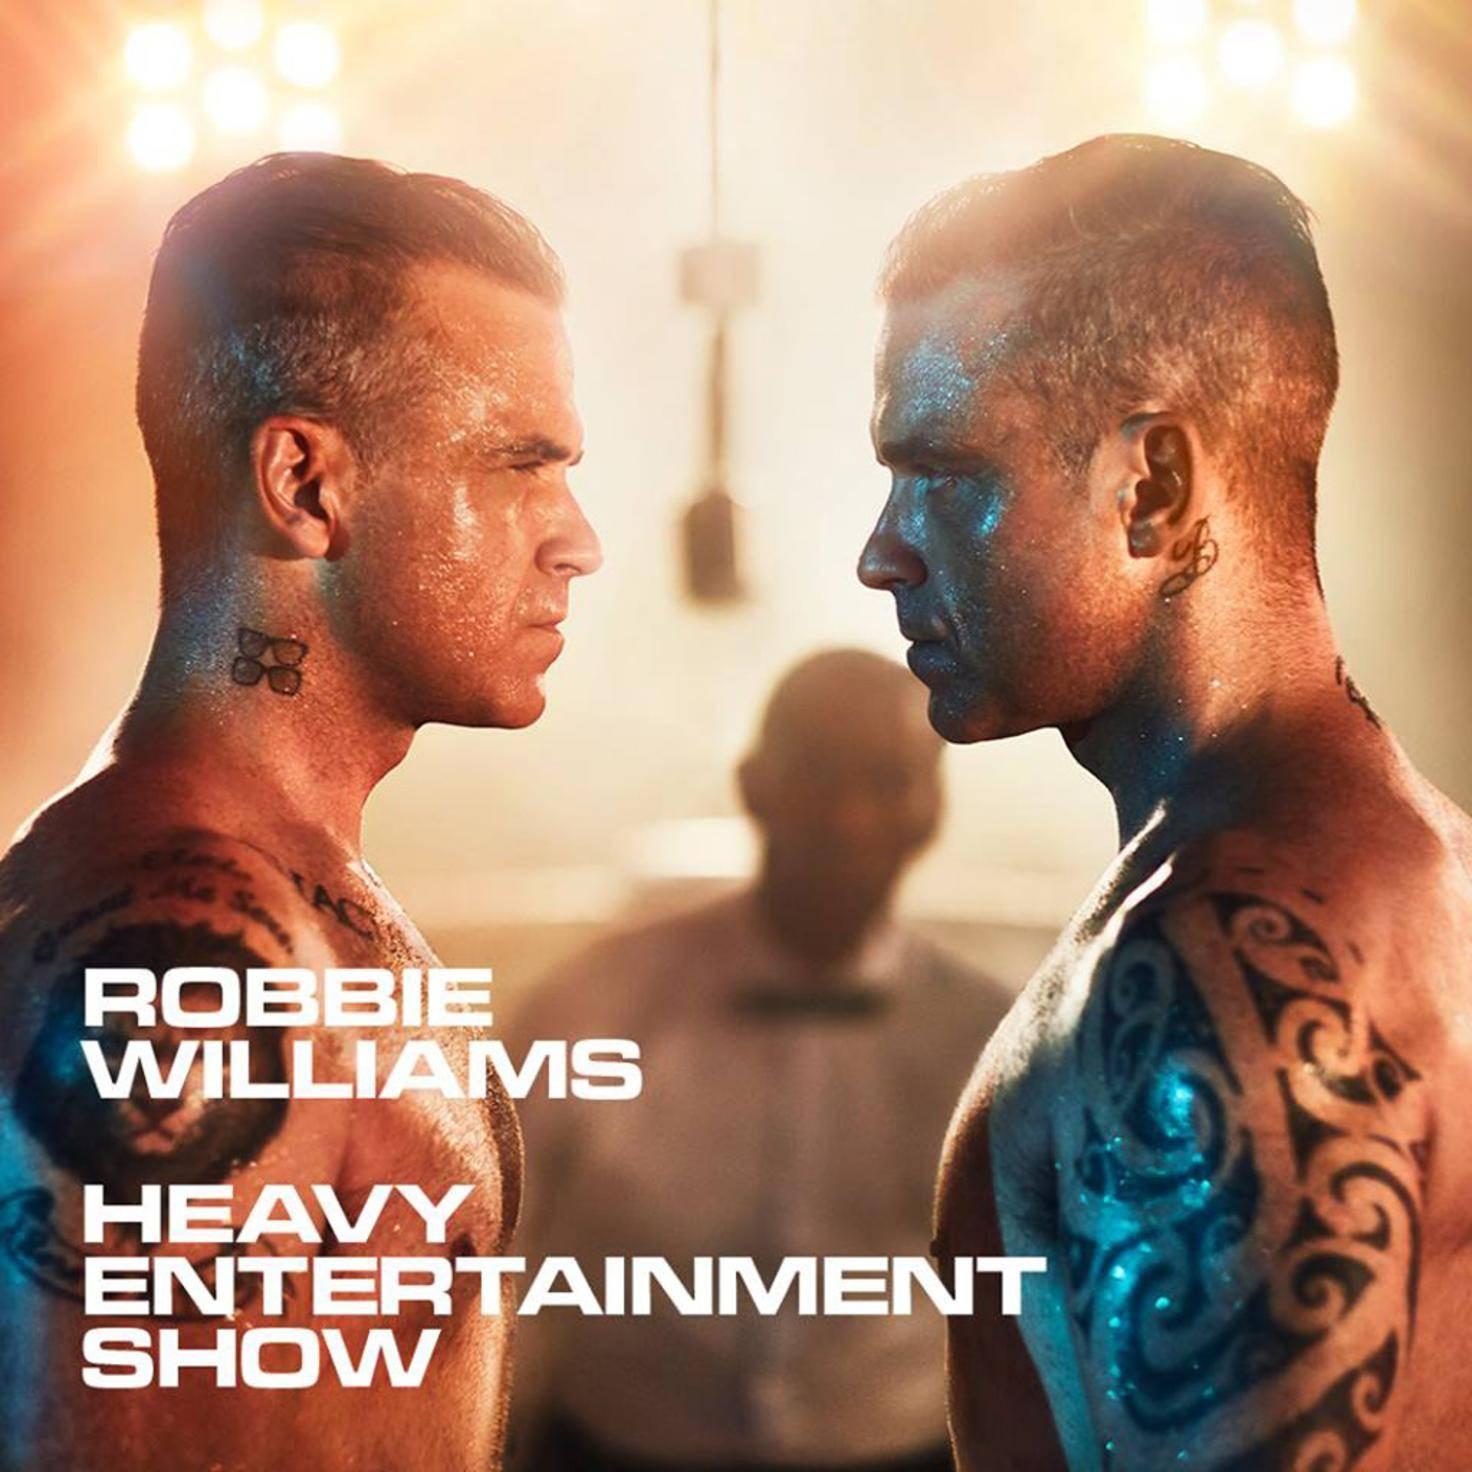 robbie williams heavy entertainemtn show album cover